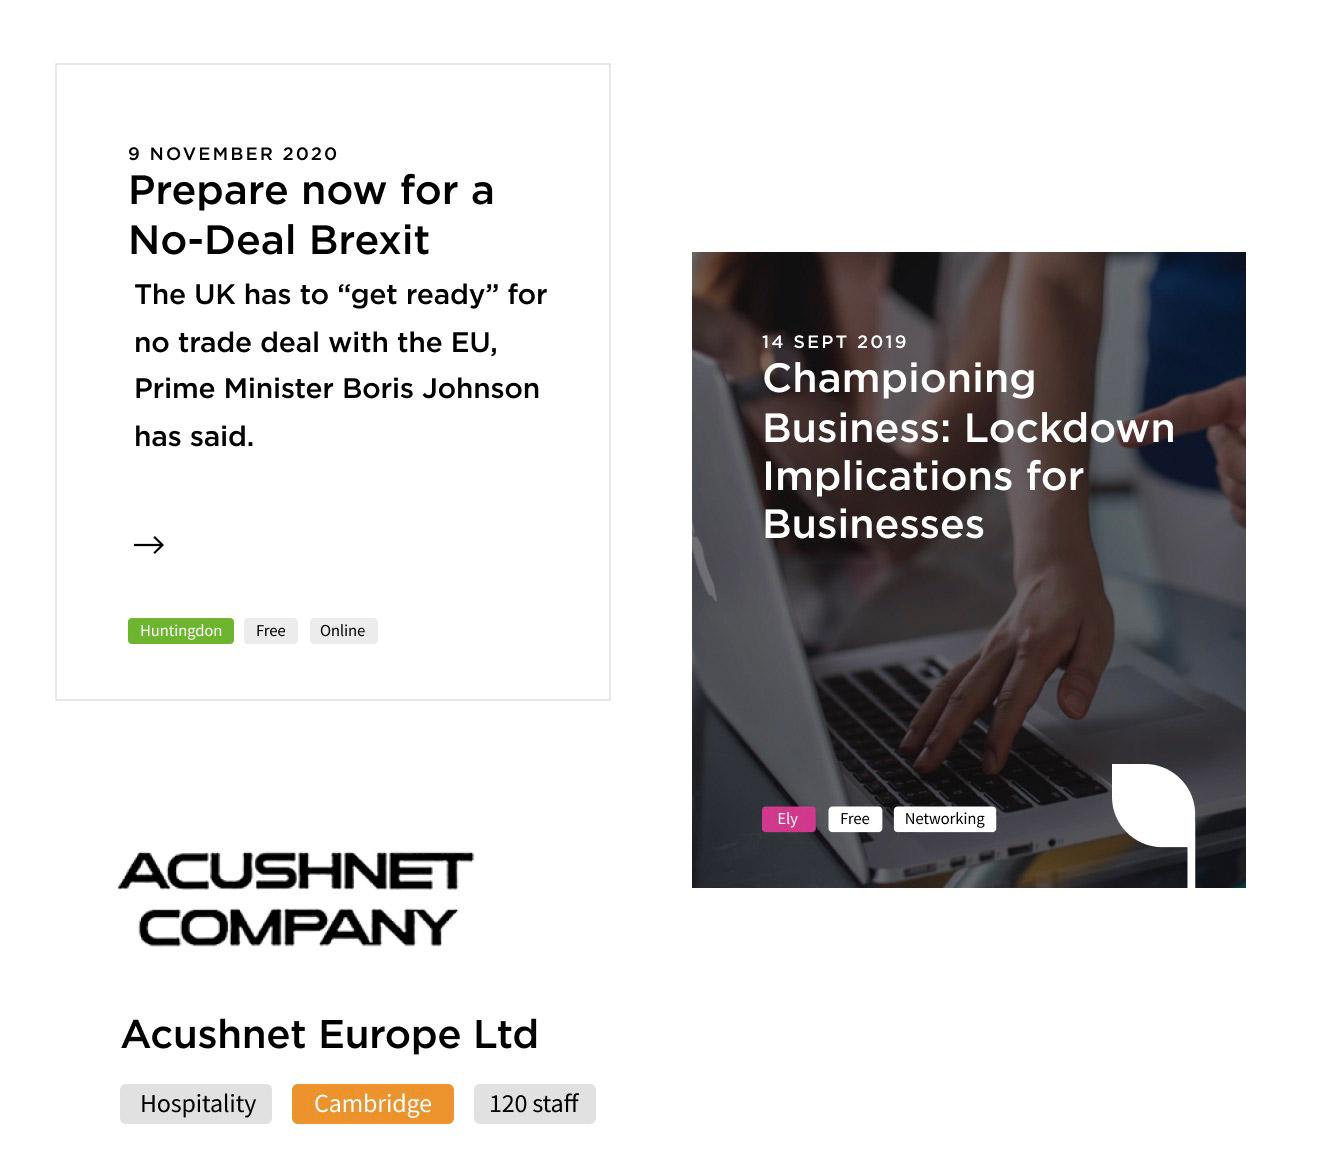 Web design mockup for Cambridge business